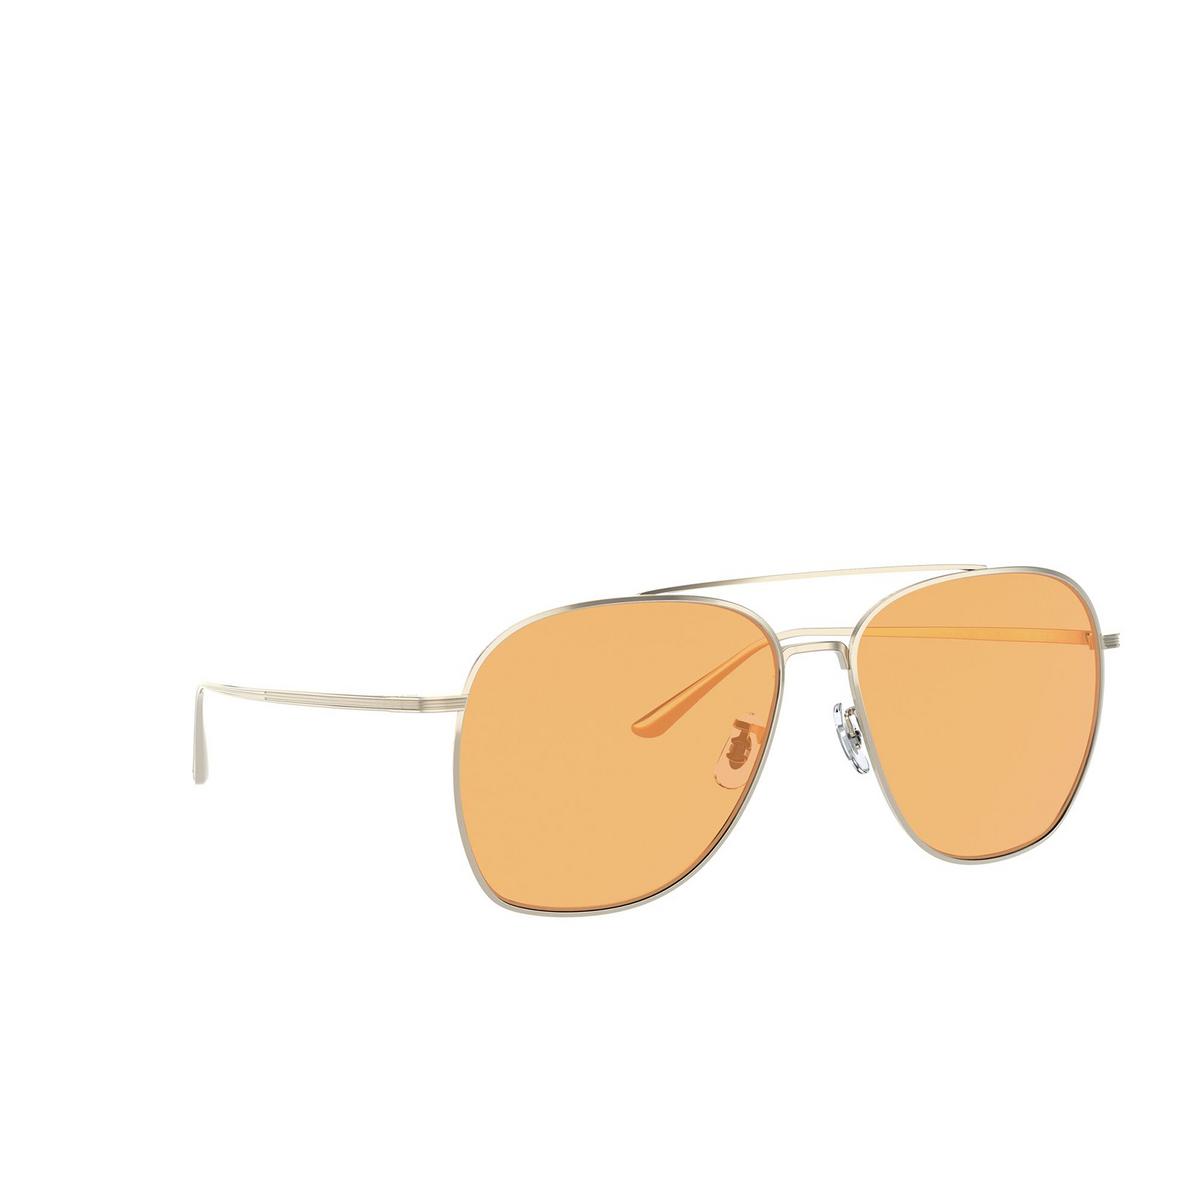 Oliver Peoples® Aviator Sunglasses: Ellerston OV1278ST color Gold 5292V9 - three-quarters view.